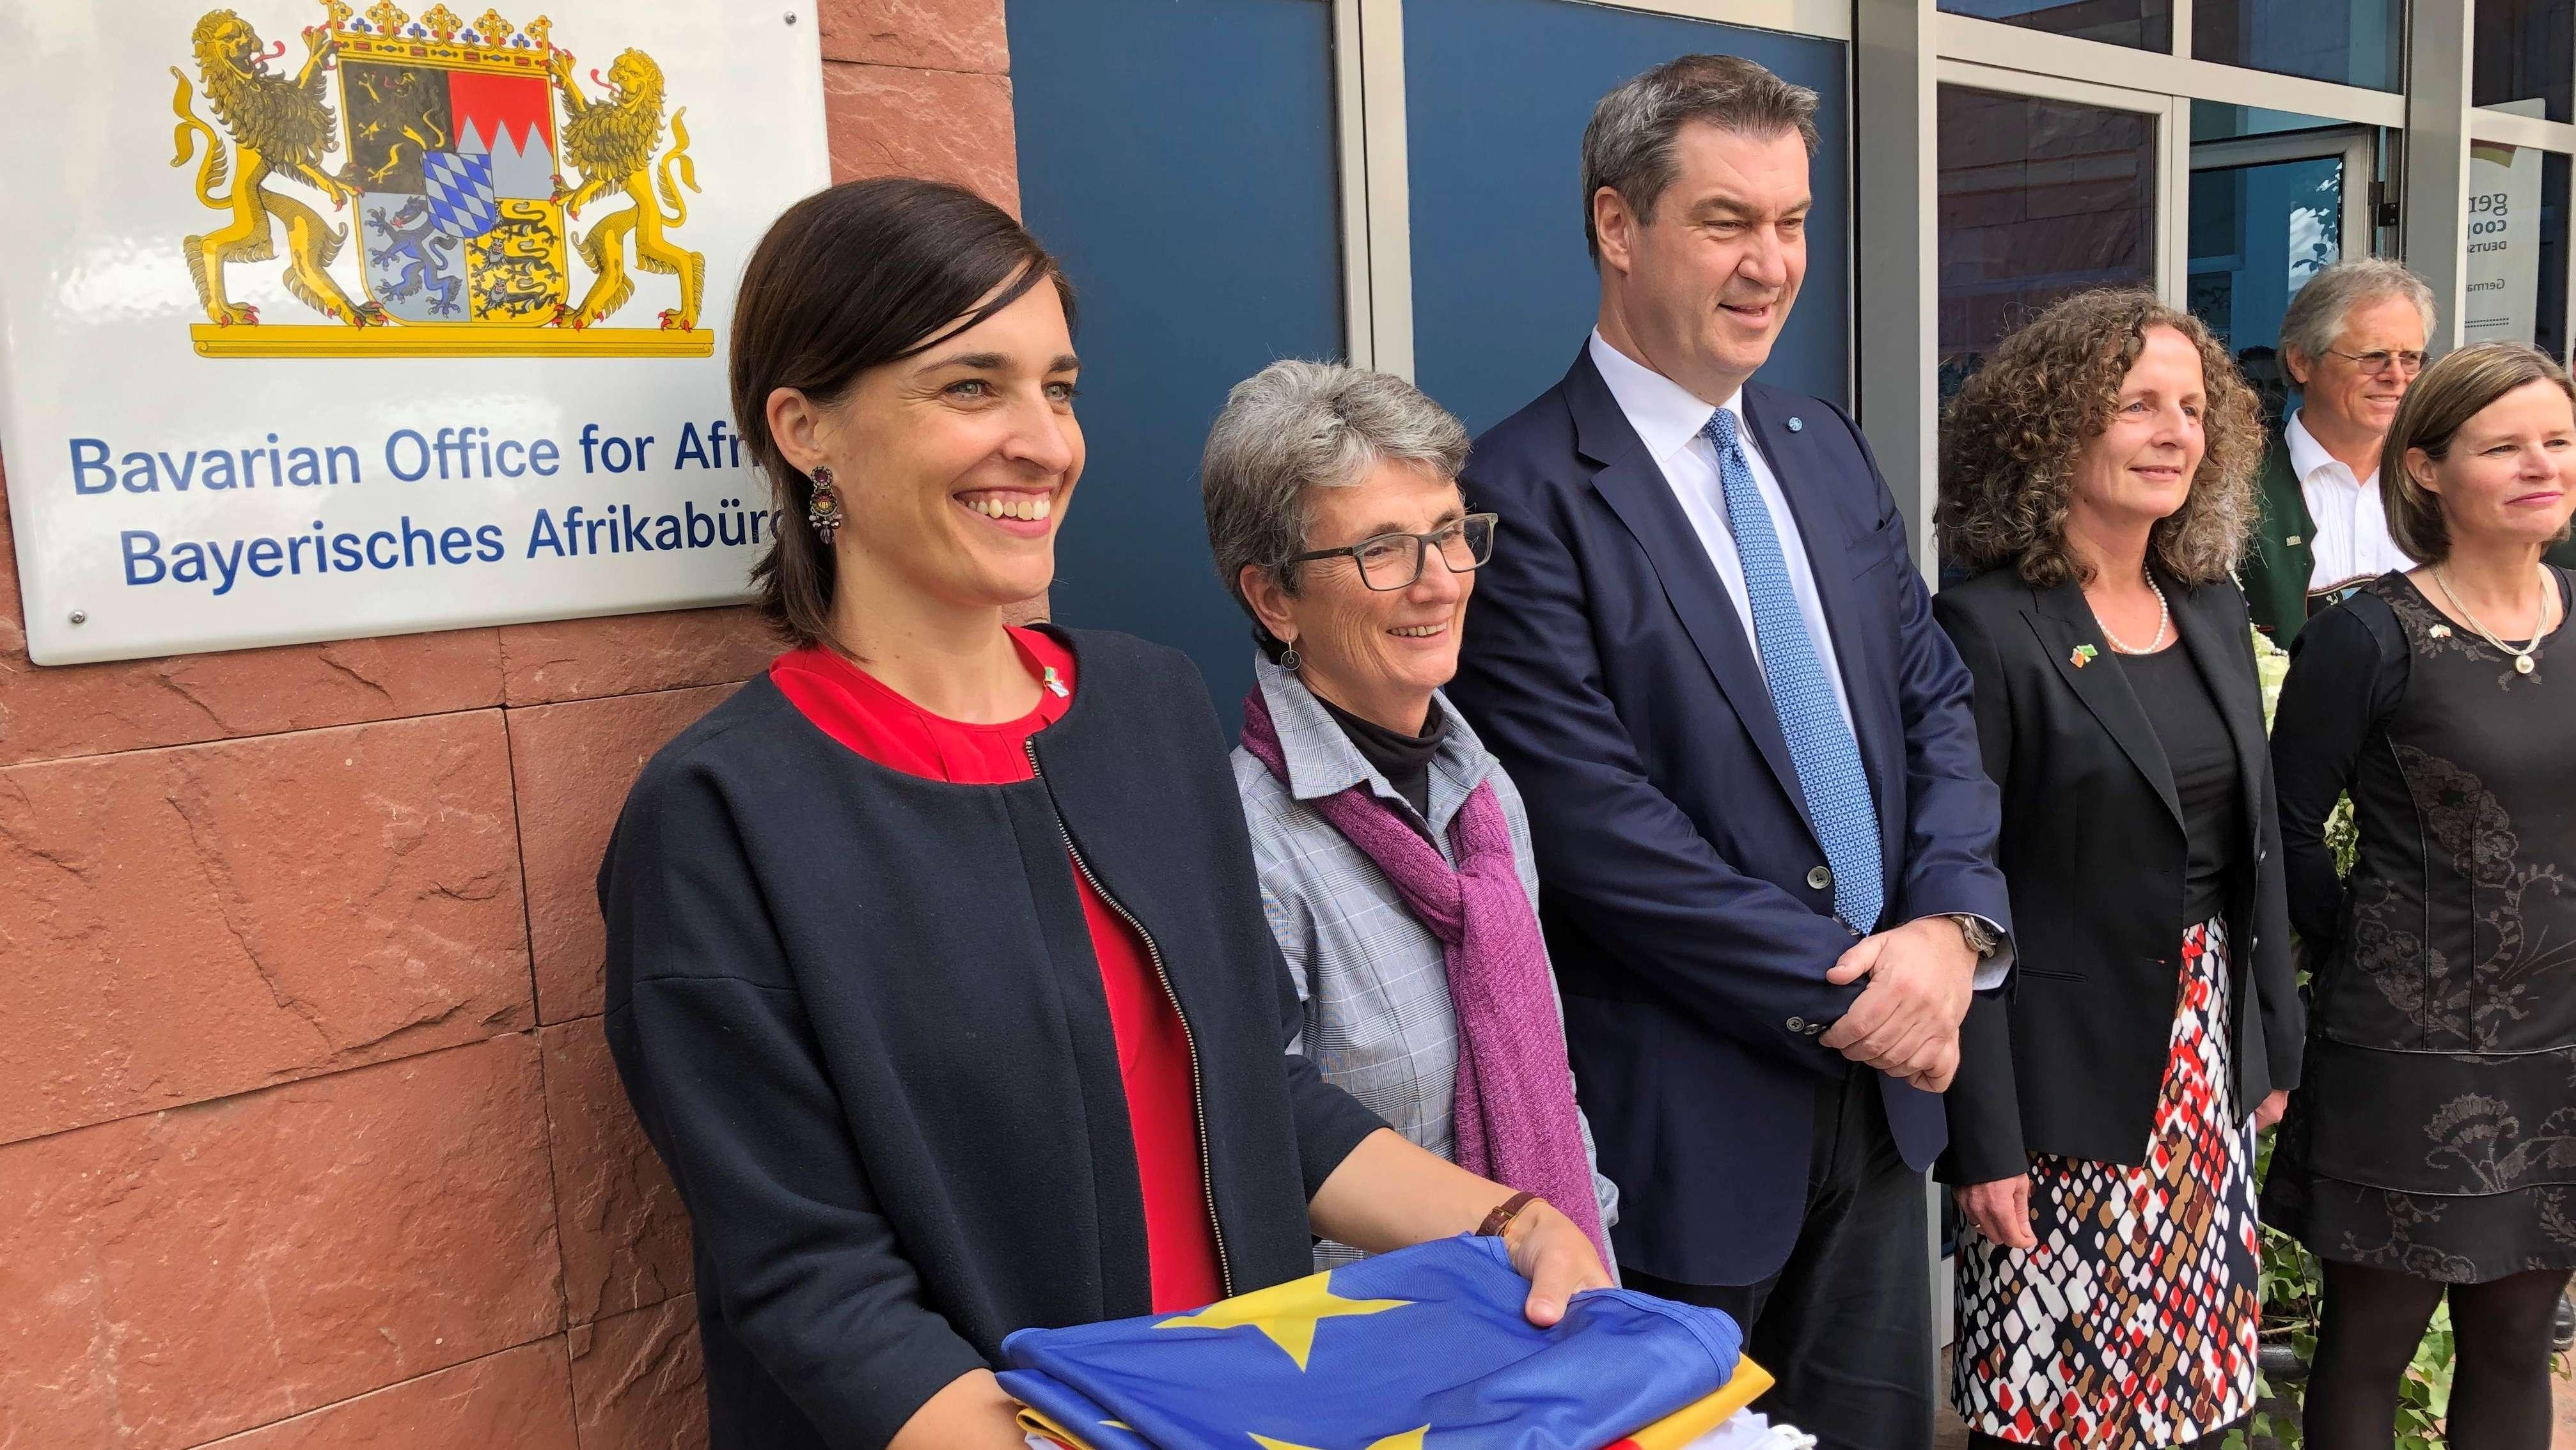 Ministerpräsident Markus Söder eröffnet erstes bayerisches Afrikabüro